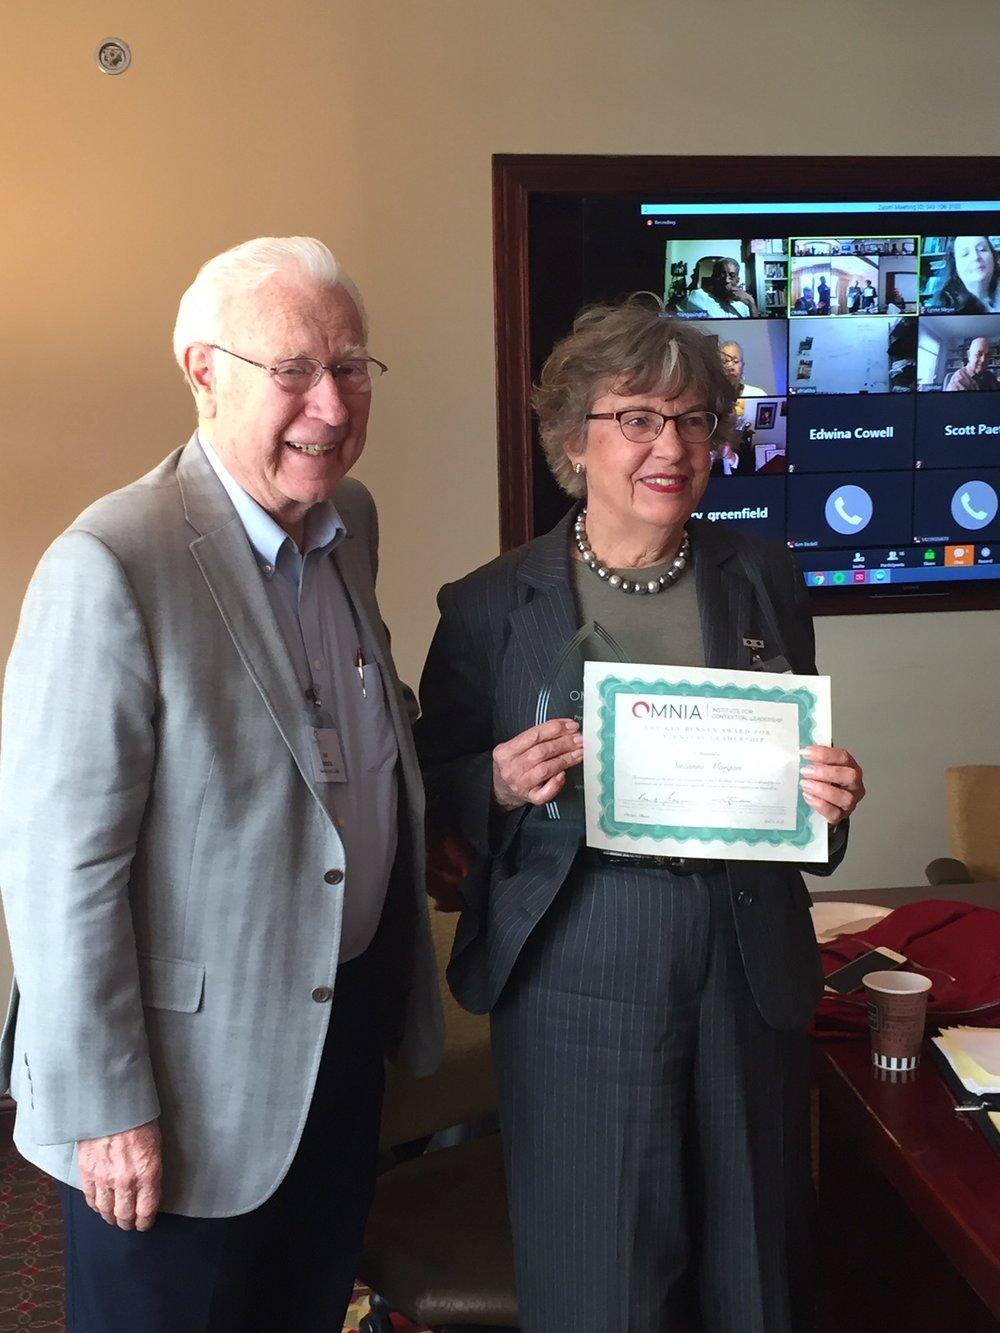 Rev. Dr. Ken Bensen presents OMNIAS's Leadership award to Suzanne Morgan